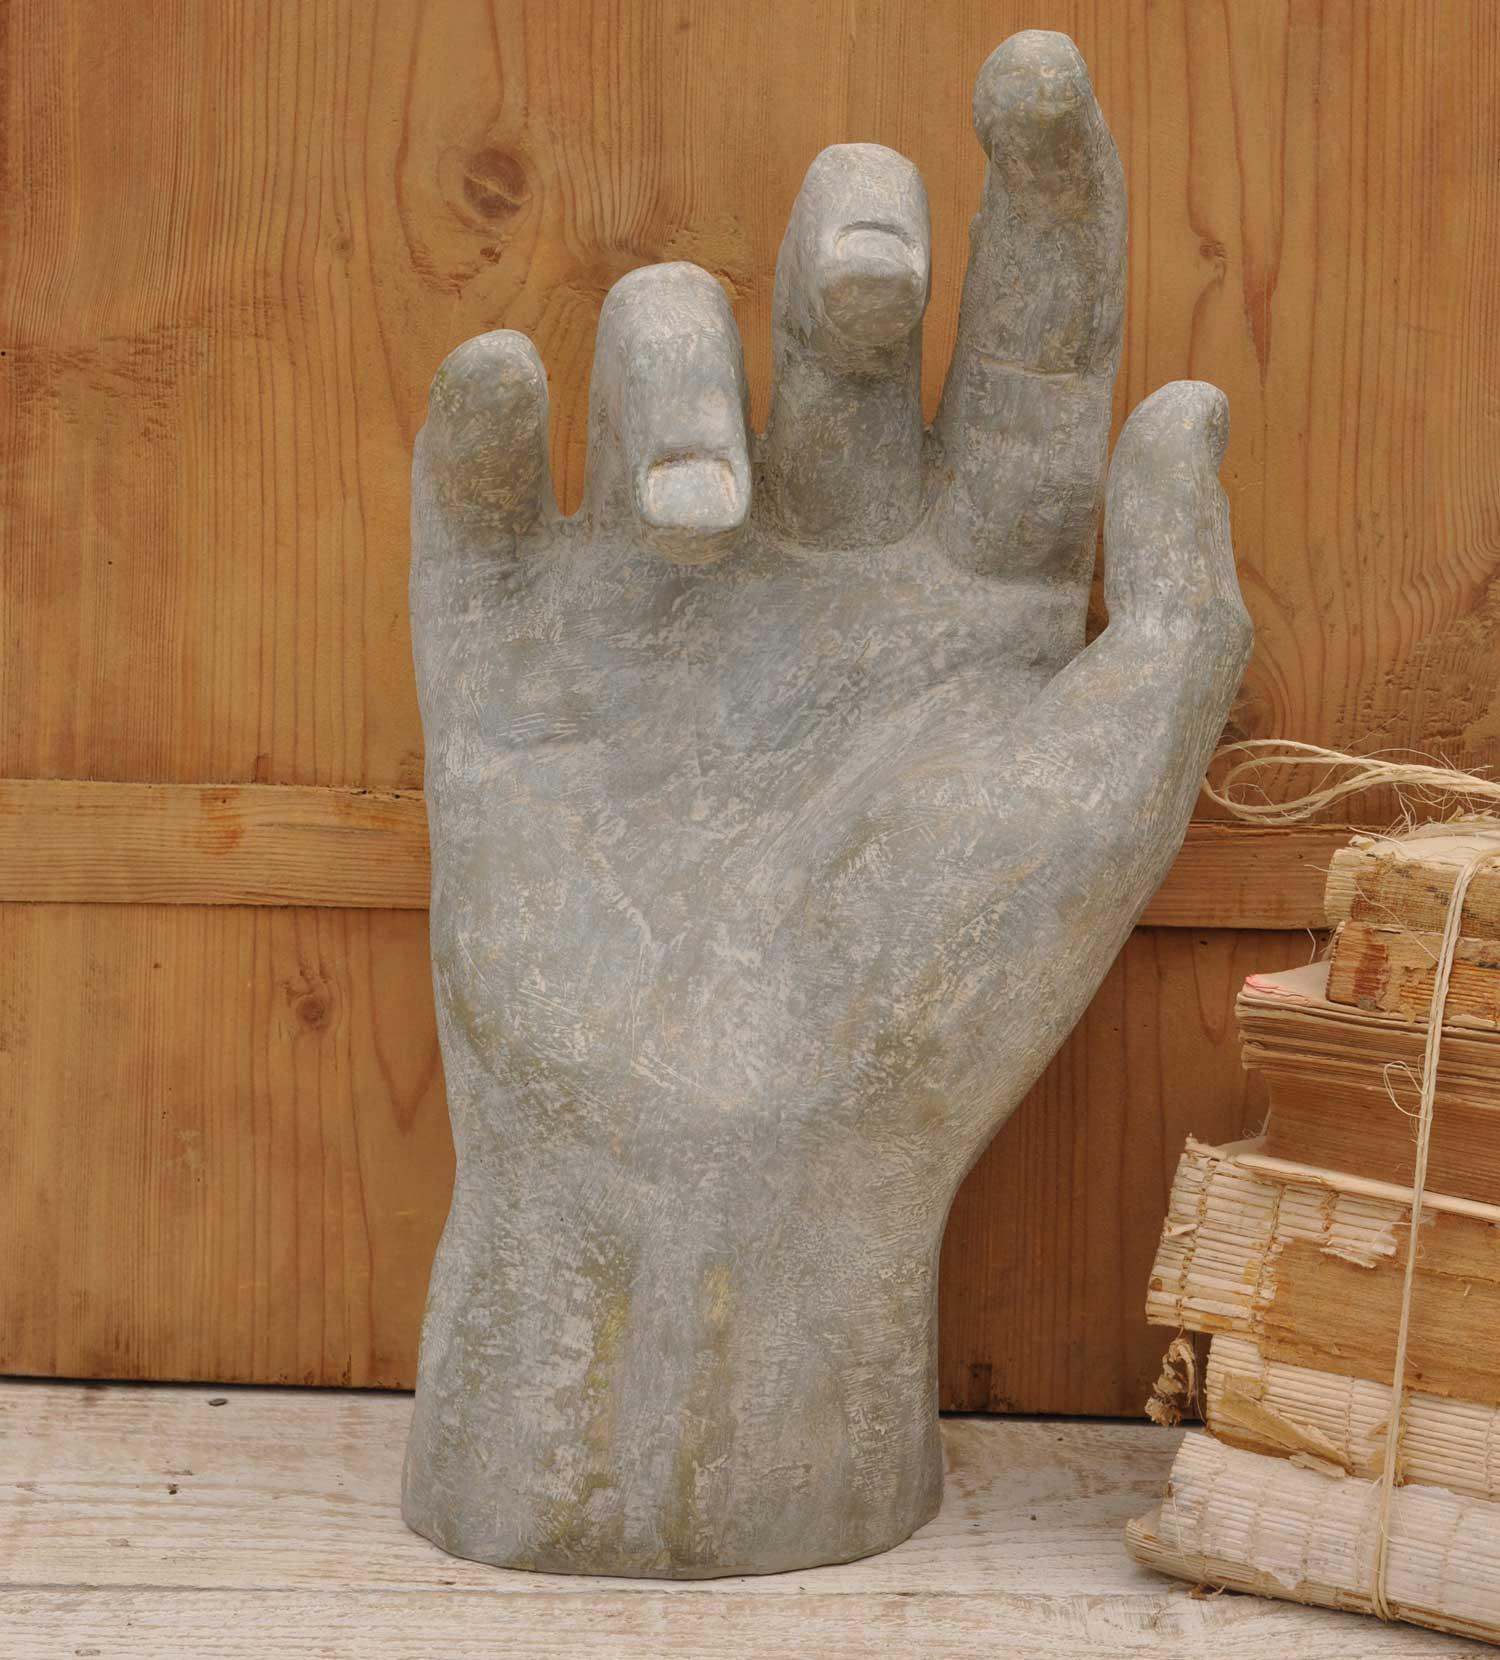 Large Hand Human Form Sculpture Home Barn Vintage